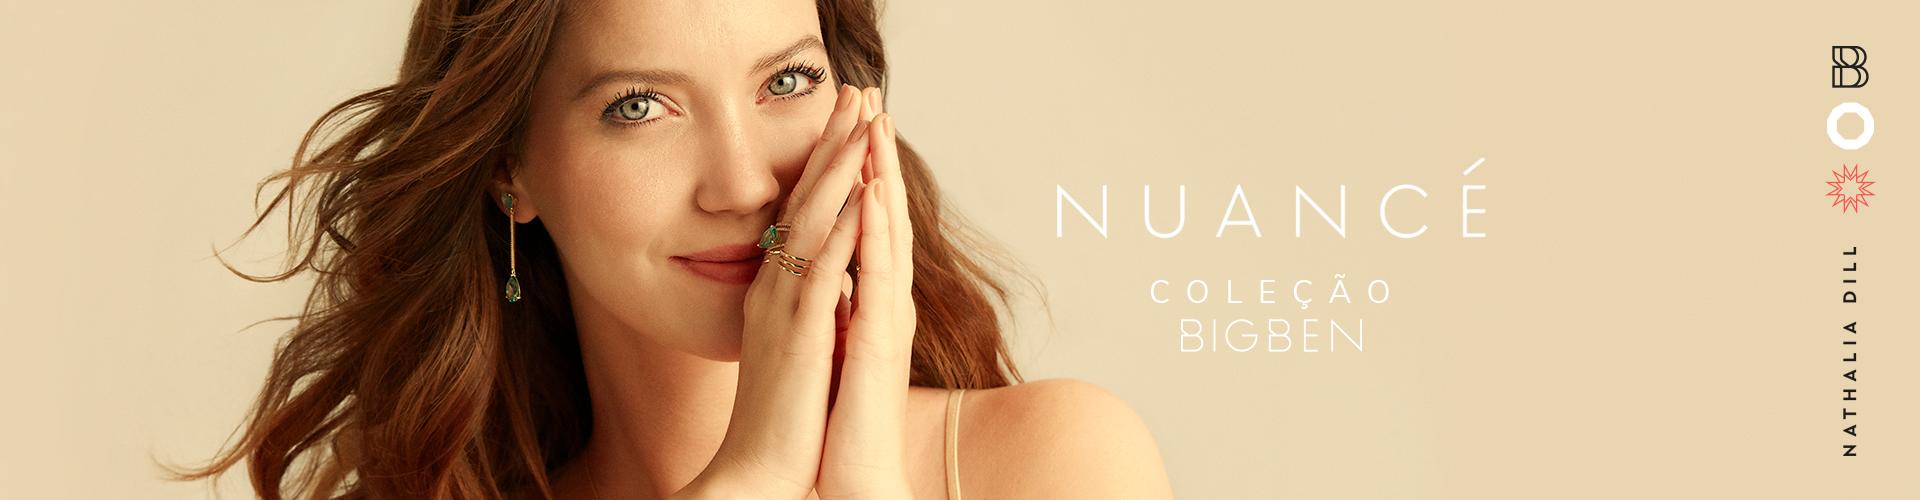 Banner2 -Nuance